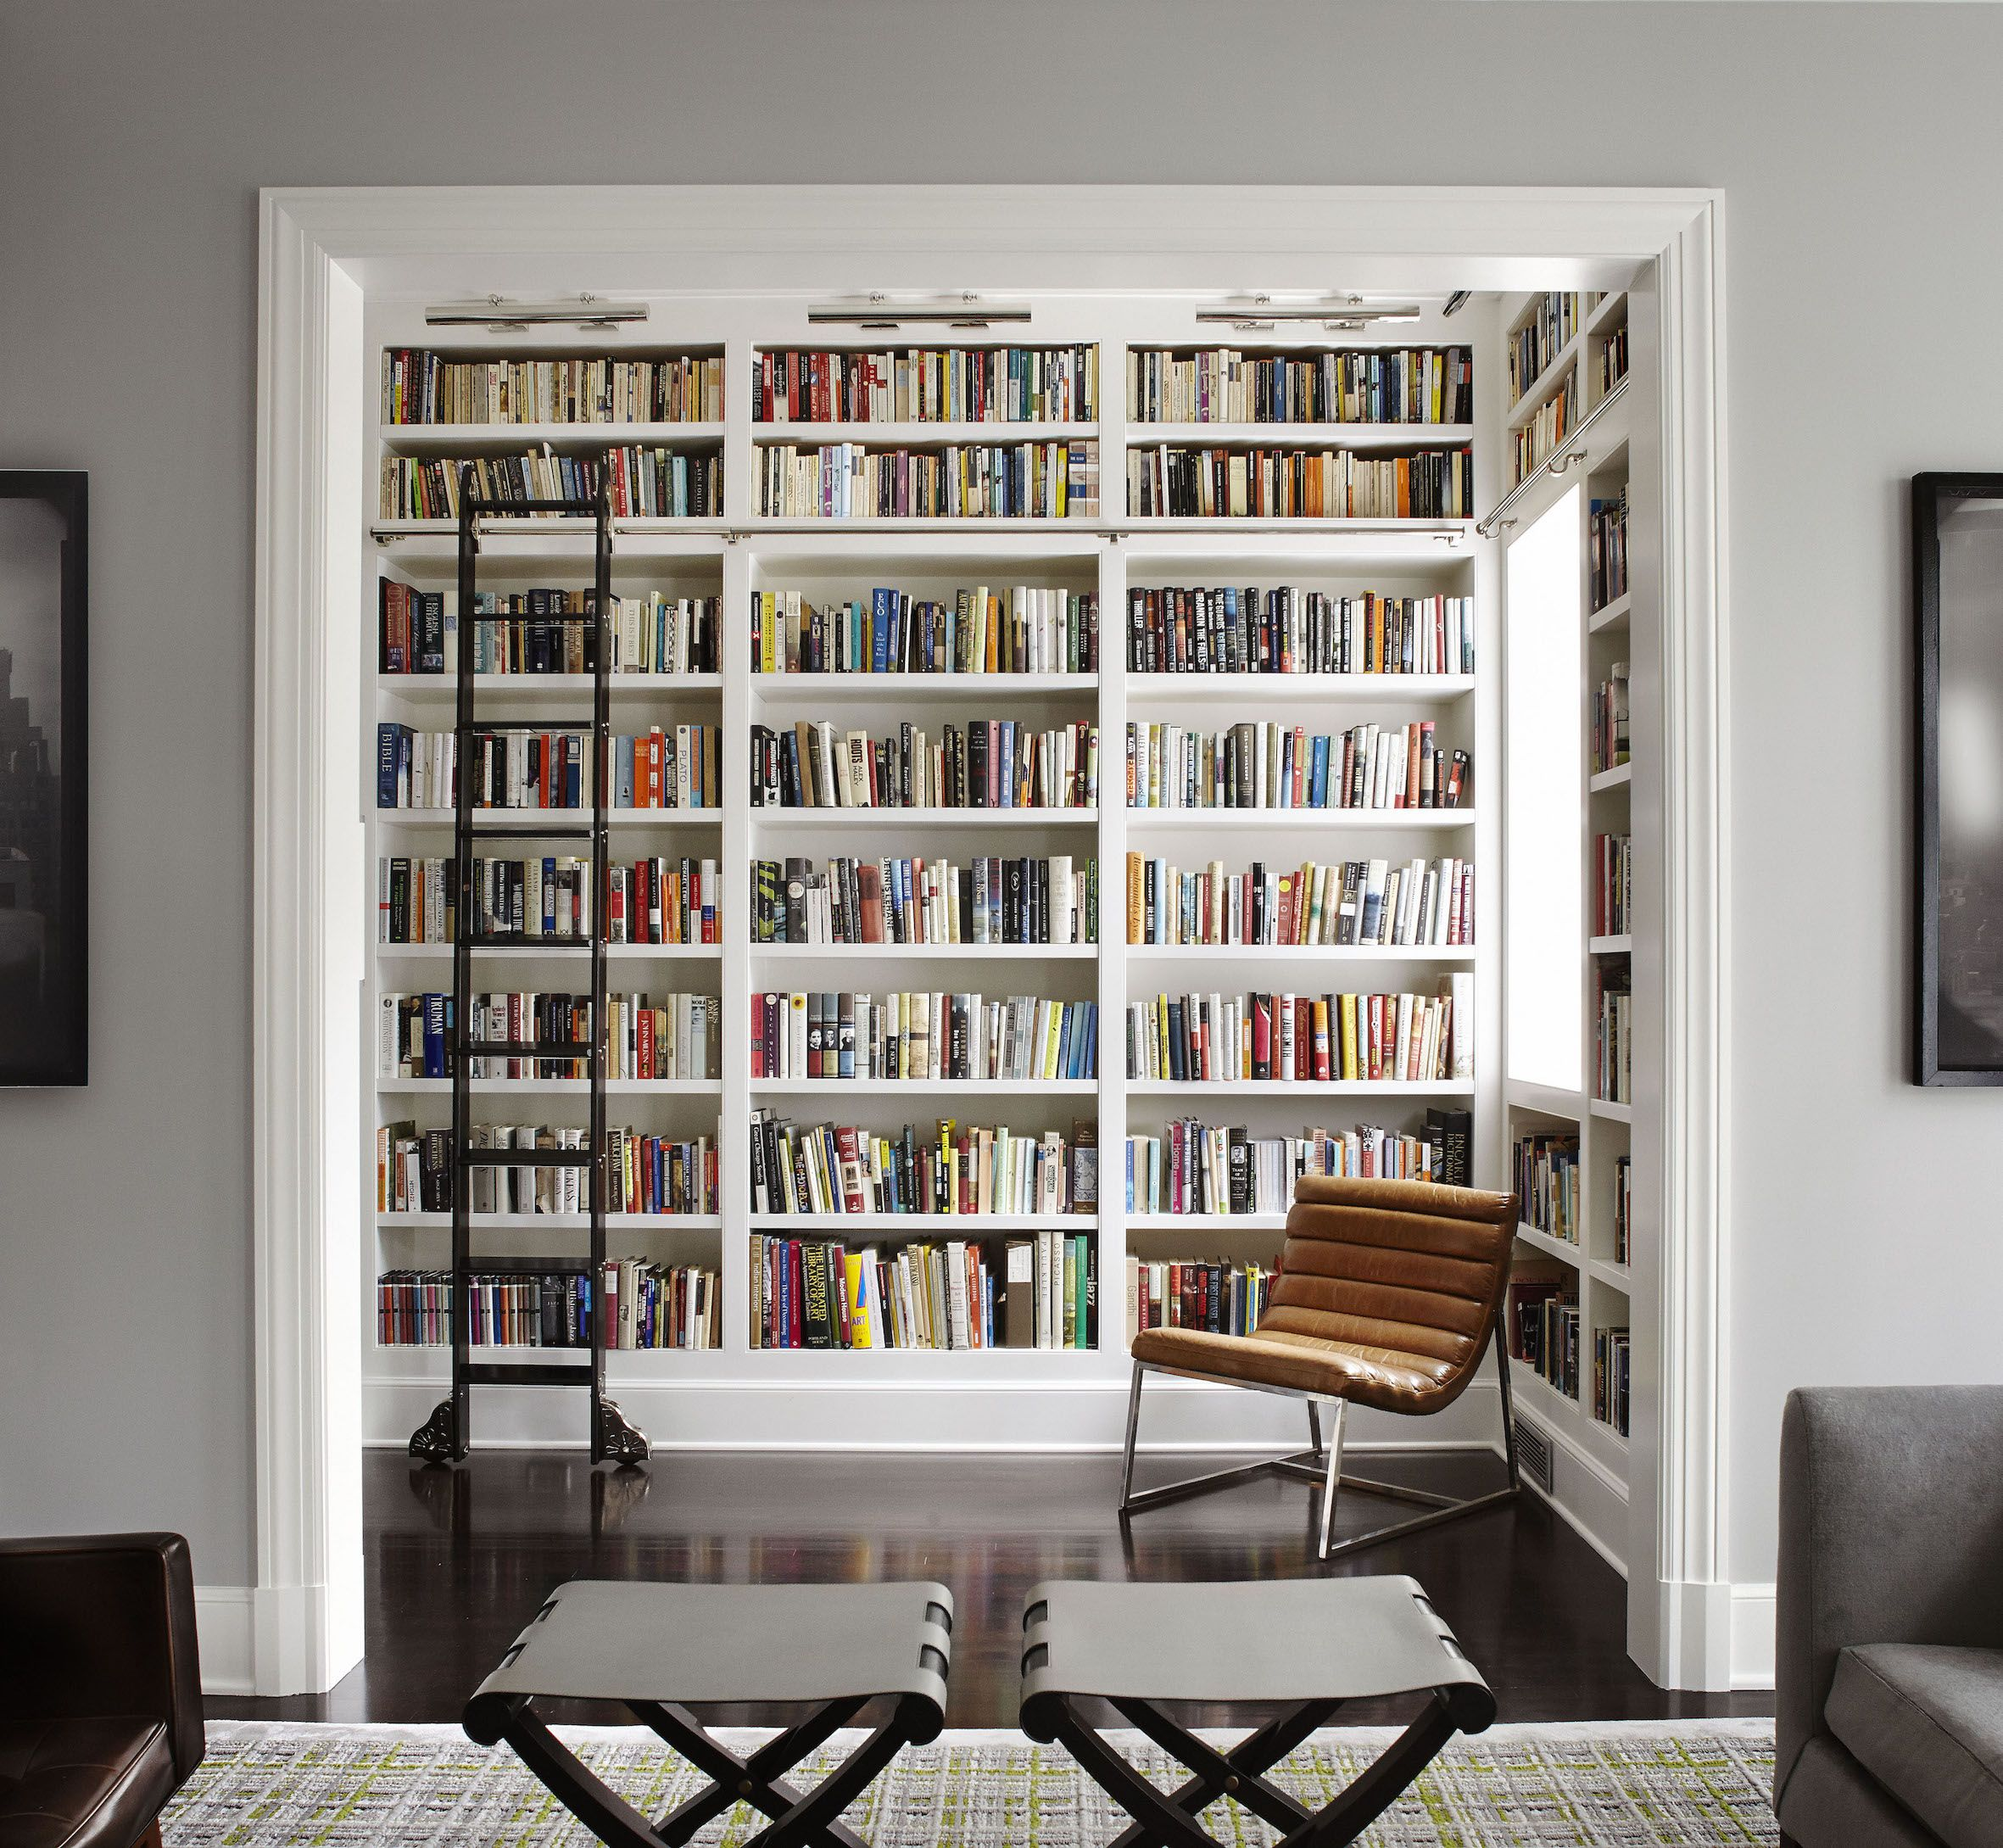 Home Library Design Ideas | Home ideas | Pinterest | Library design ...